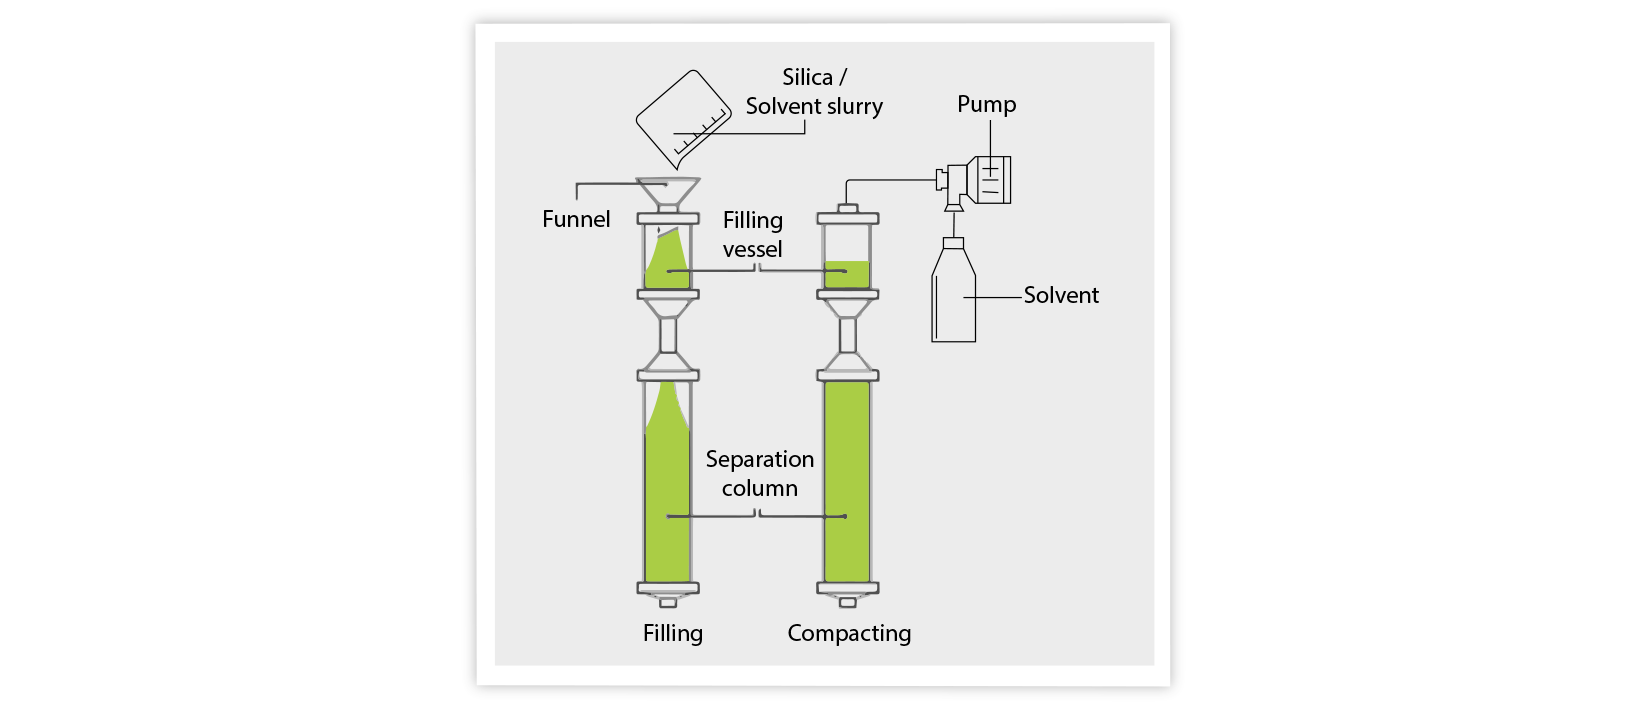 slurry packing, slurry packing process, wet packing, chromatography, chromatography columns